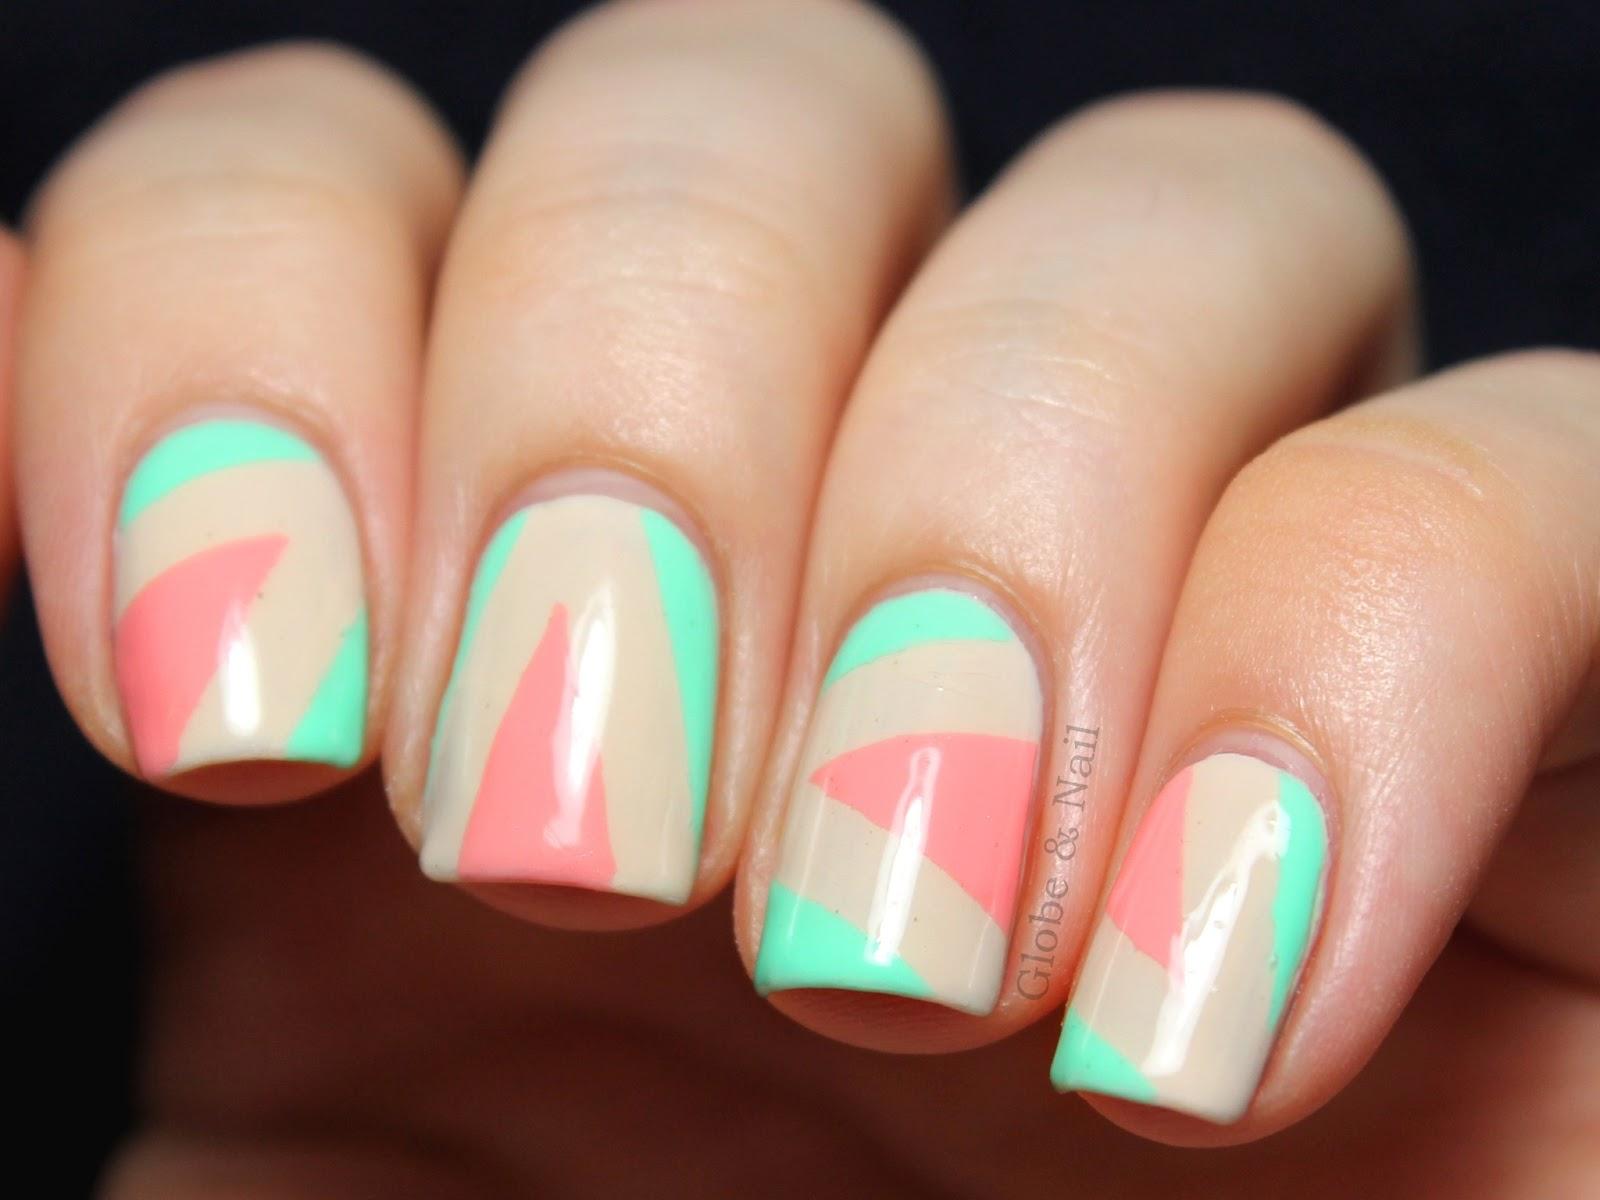 Bright neon acrylic nails 1417609 - terrasource.info